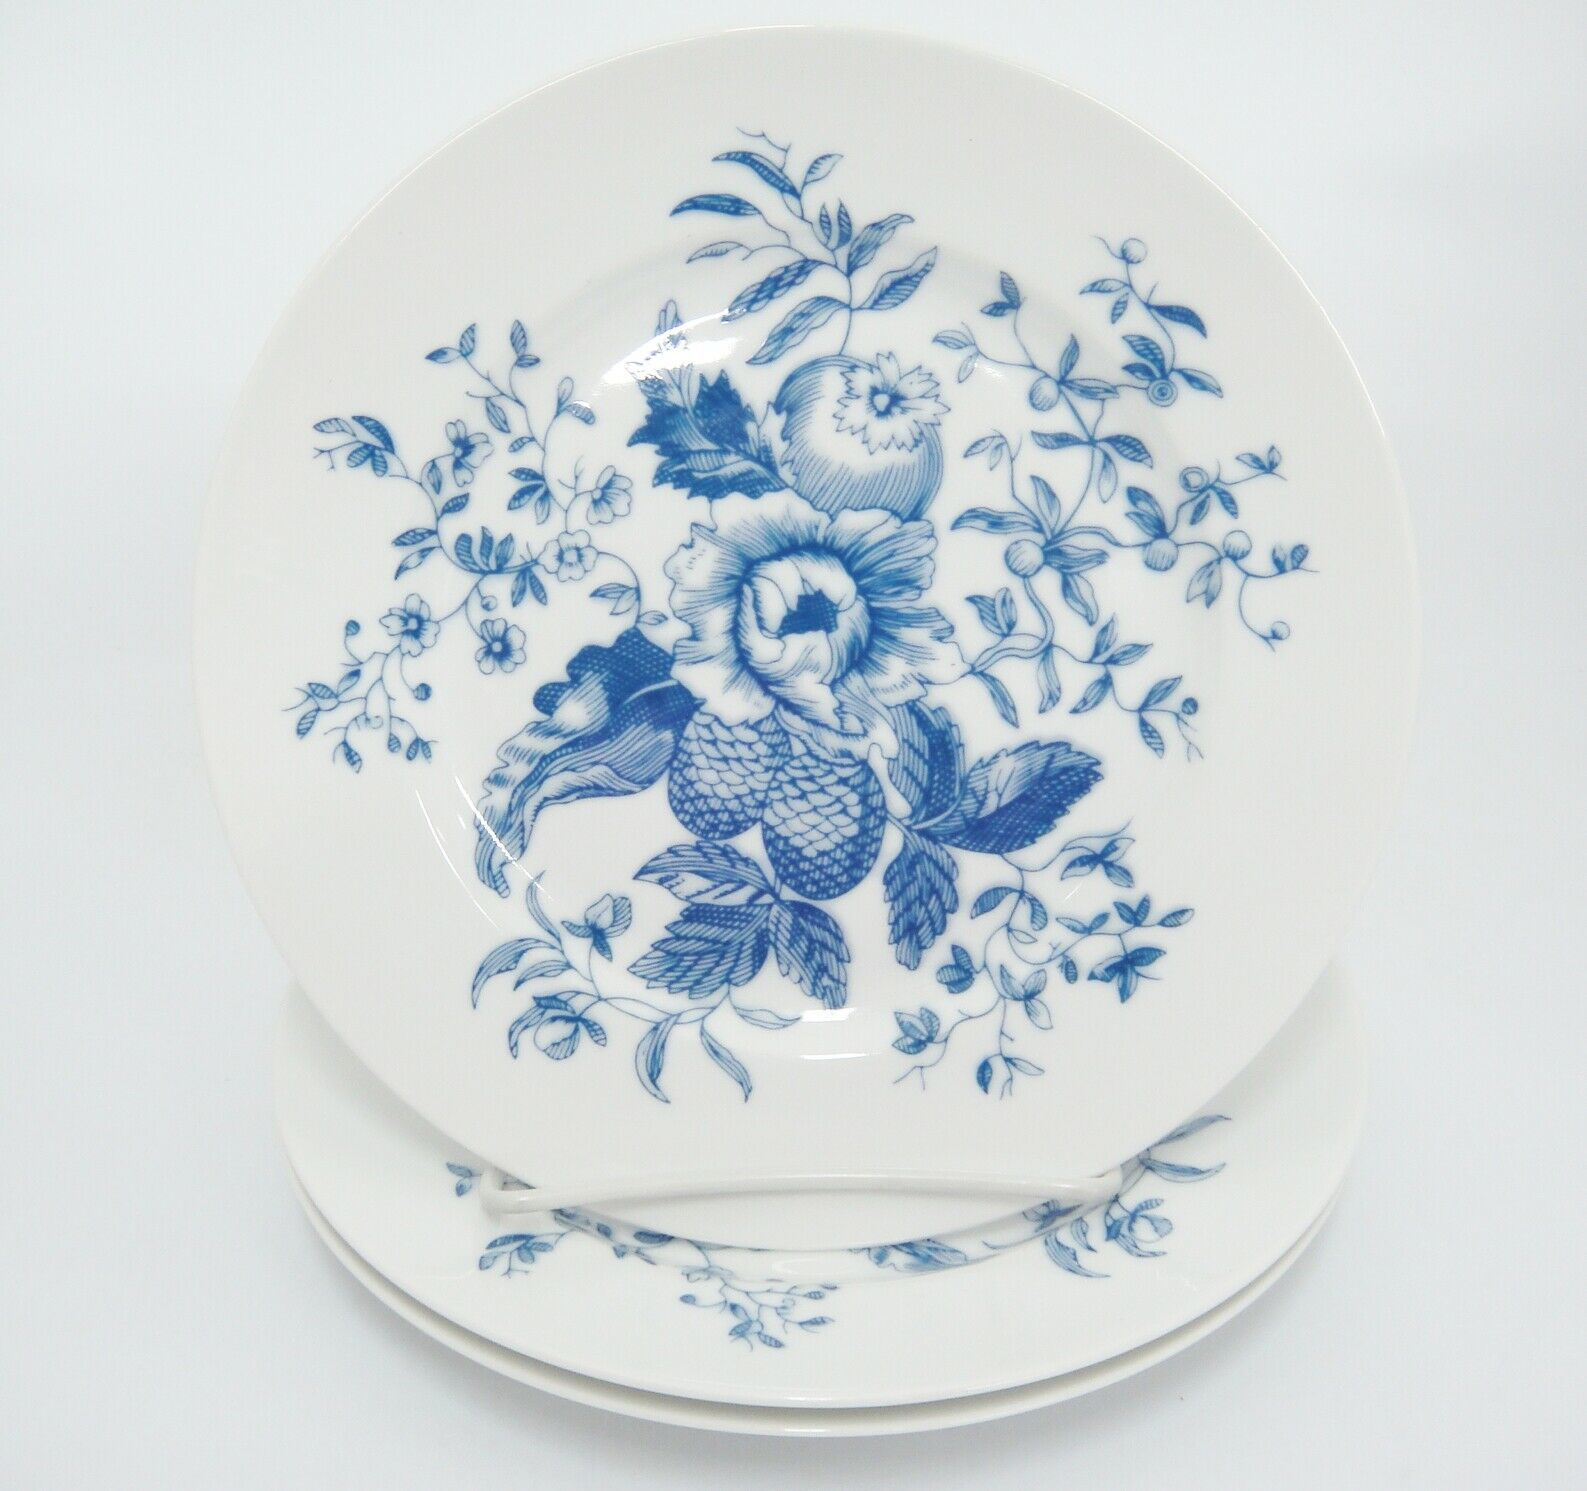 Royal Worcester Rhapsody Salad Plates Lot of 3 Blue Floral England Excellent image 2